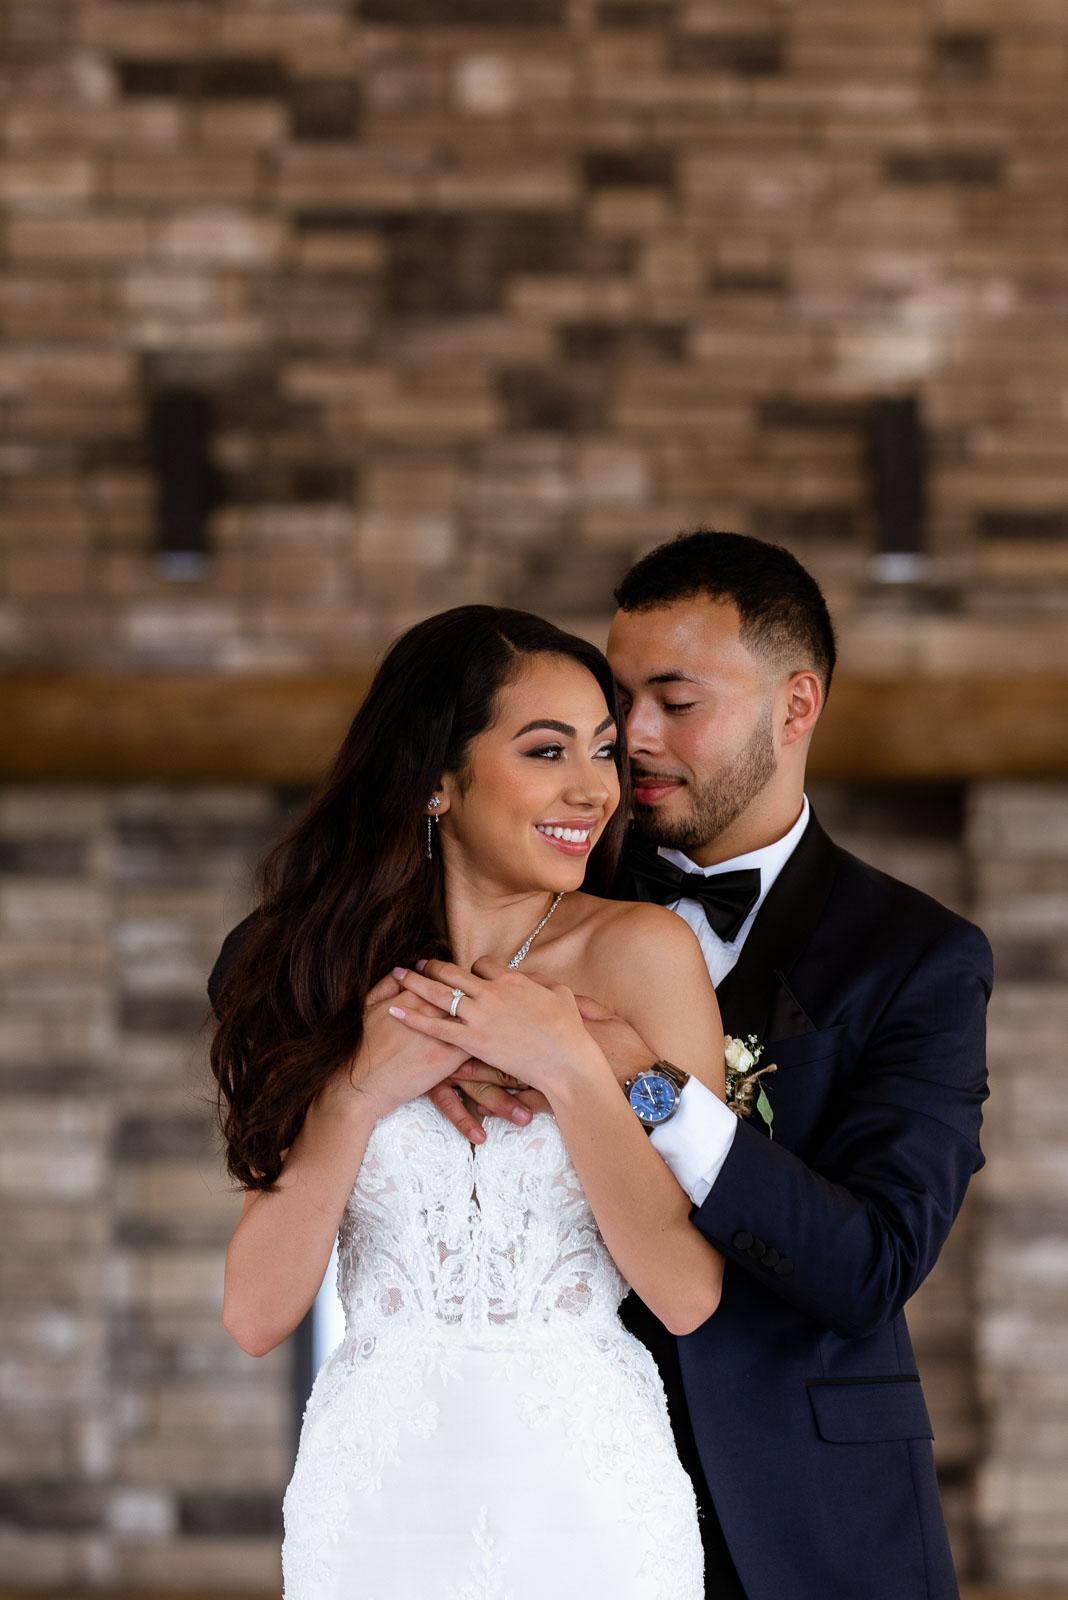 Intimate Wedding Photos | Josie V Photography